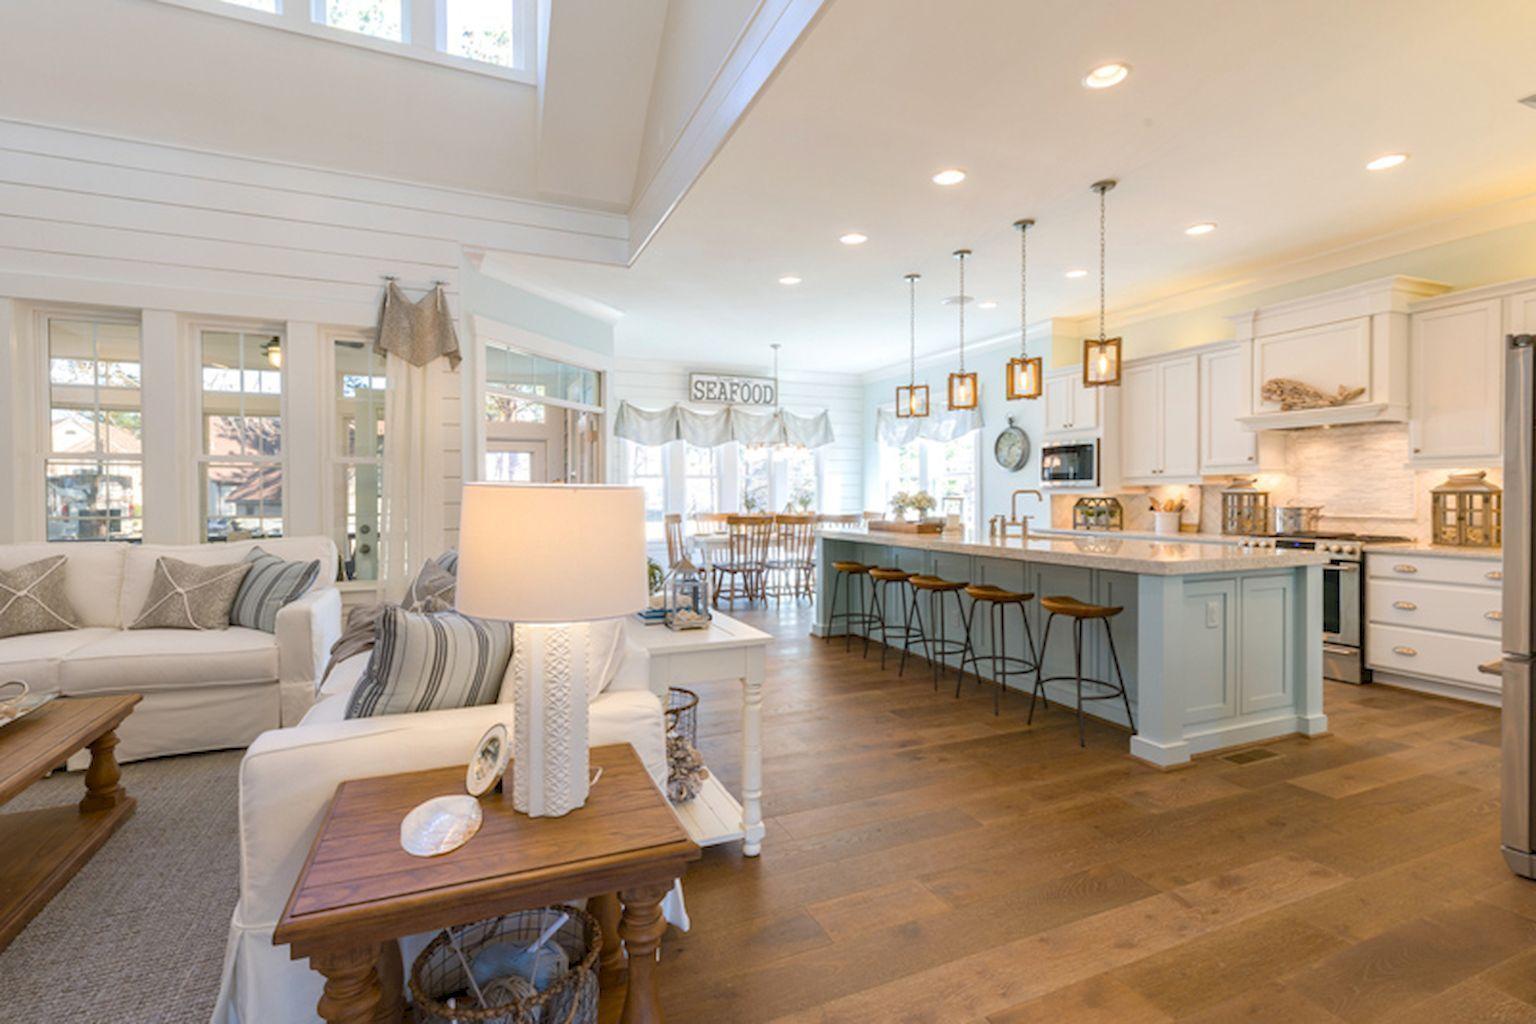 Adorable 65 Comfy Coastal Living Room Decorating Ideas Https Cool Coastal Living Room Designs Inspiration Design